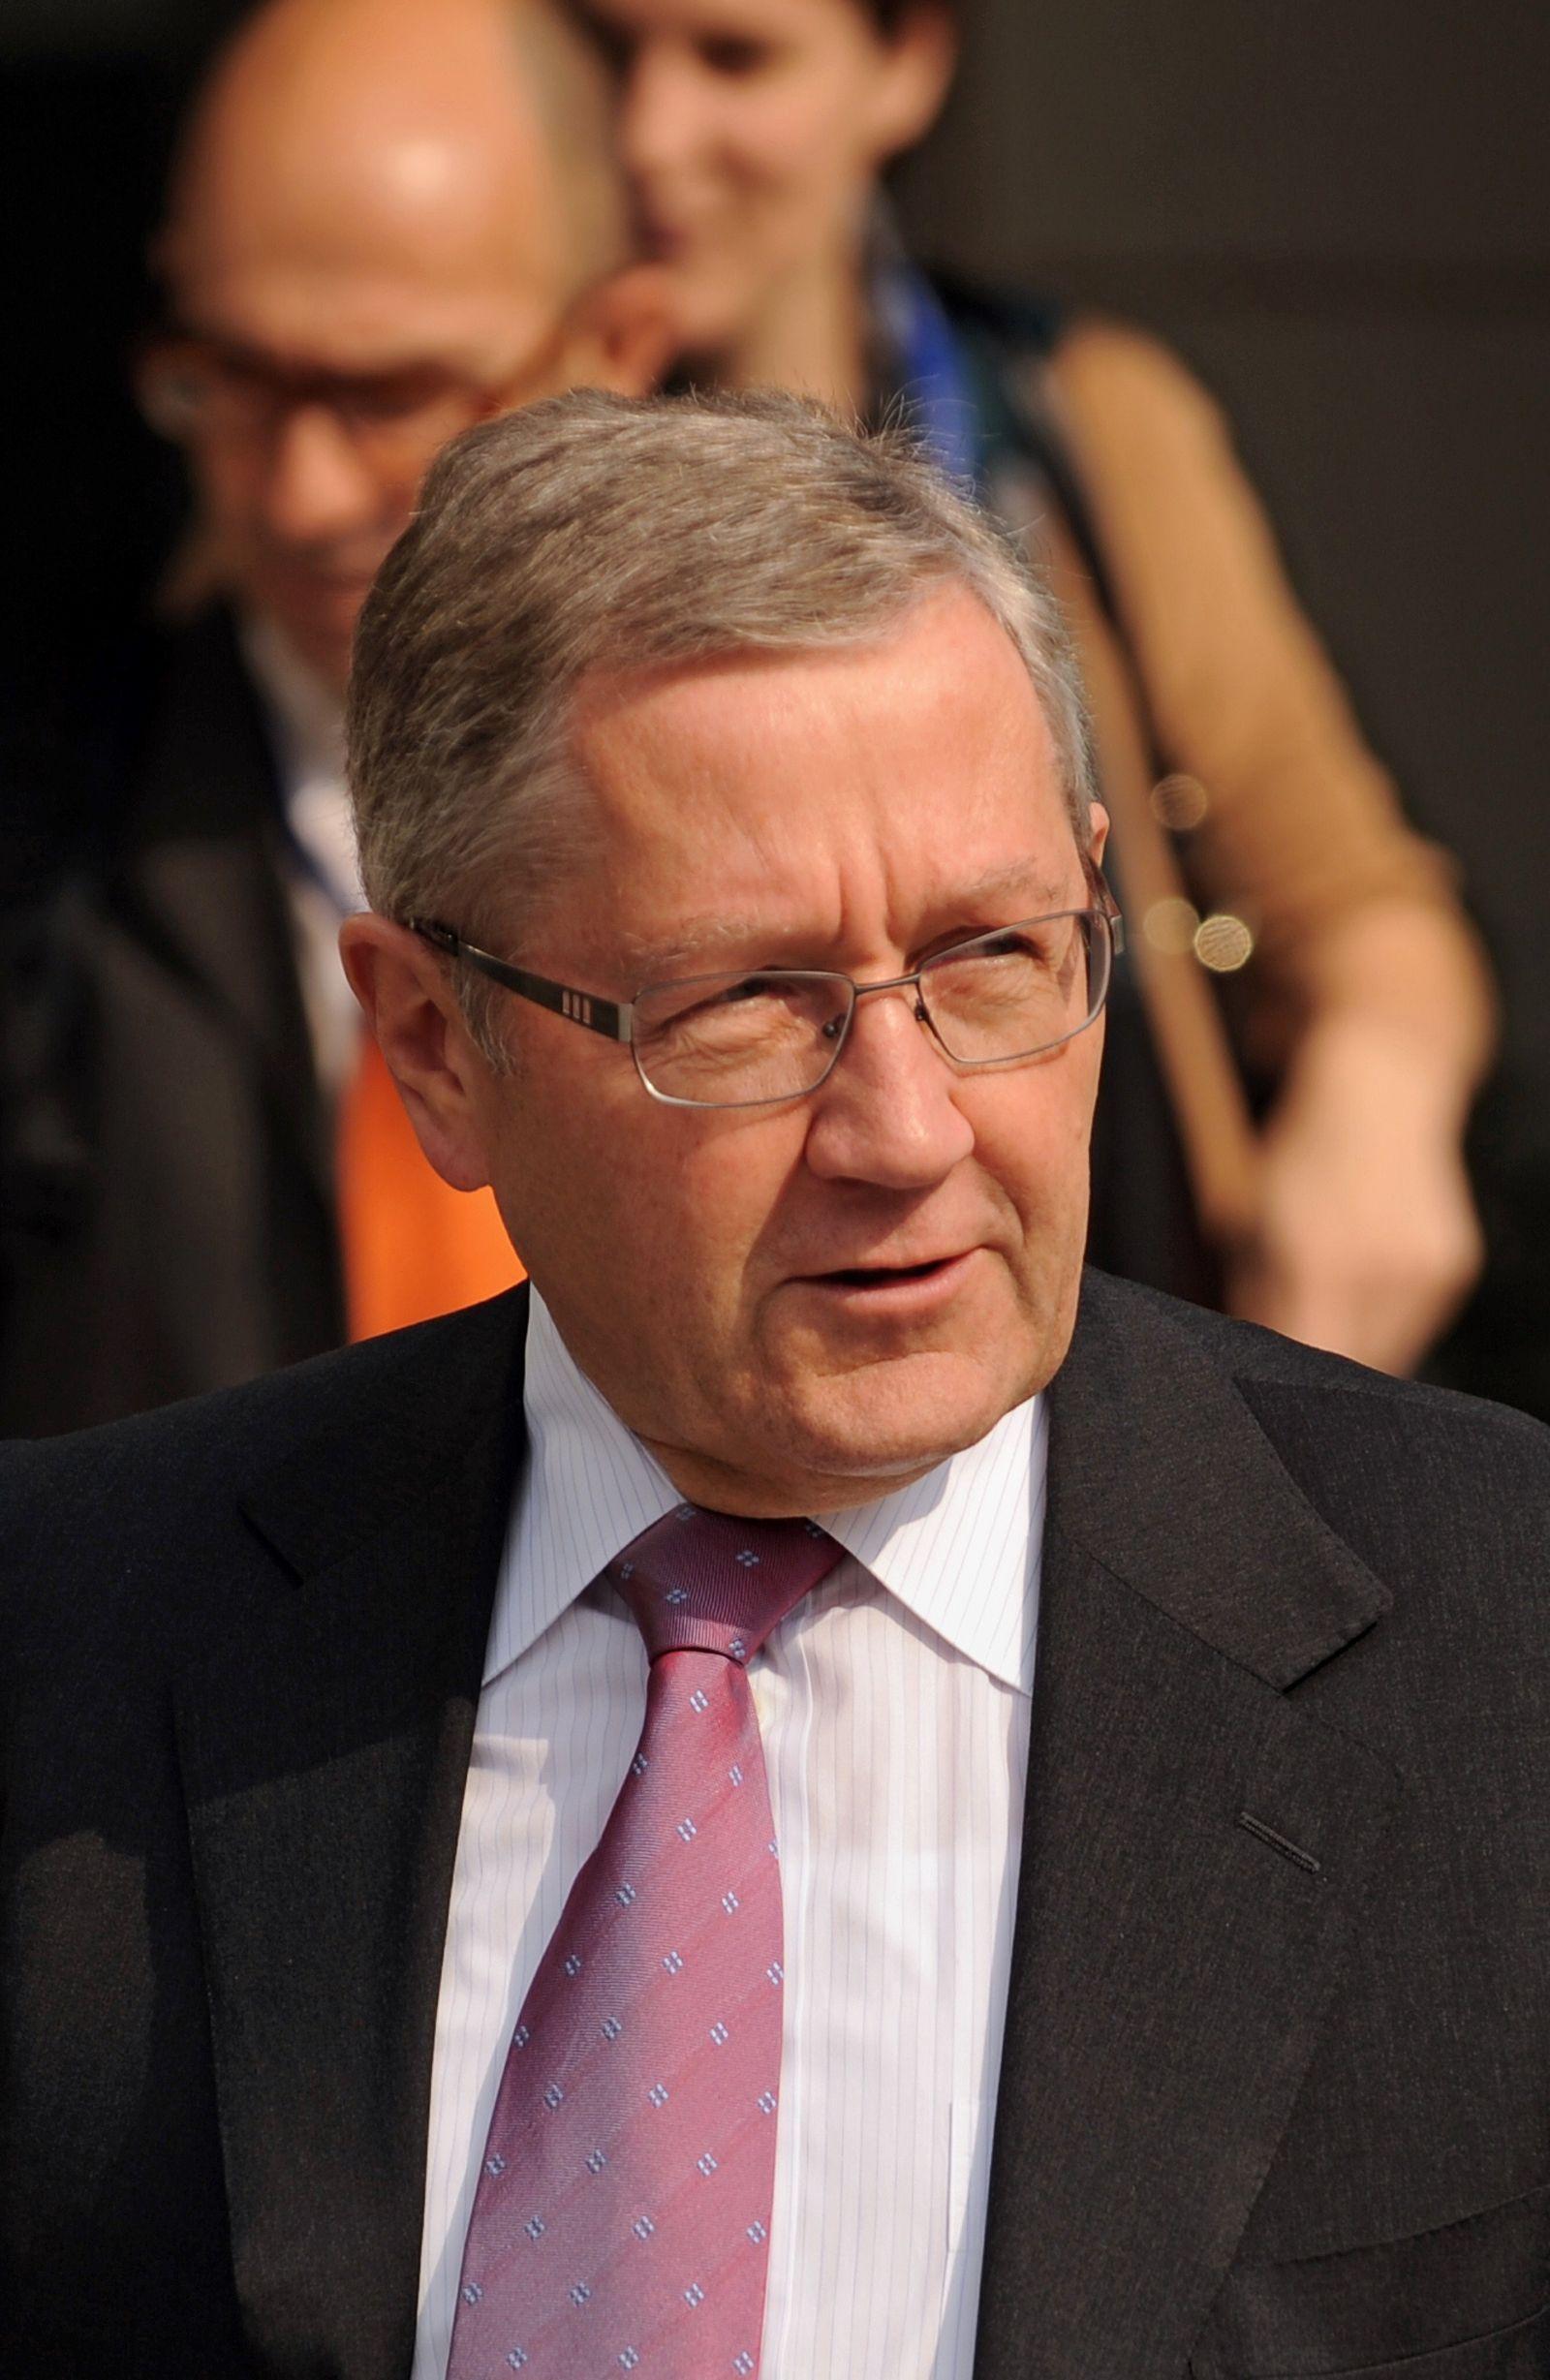 Klaus Regling / Arrival Press Conference